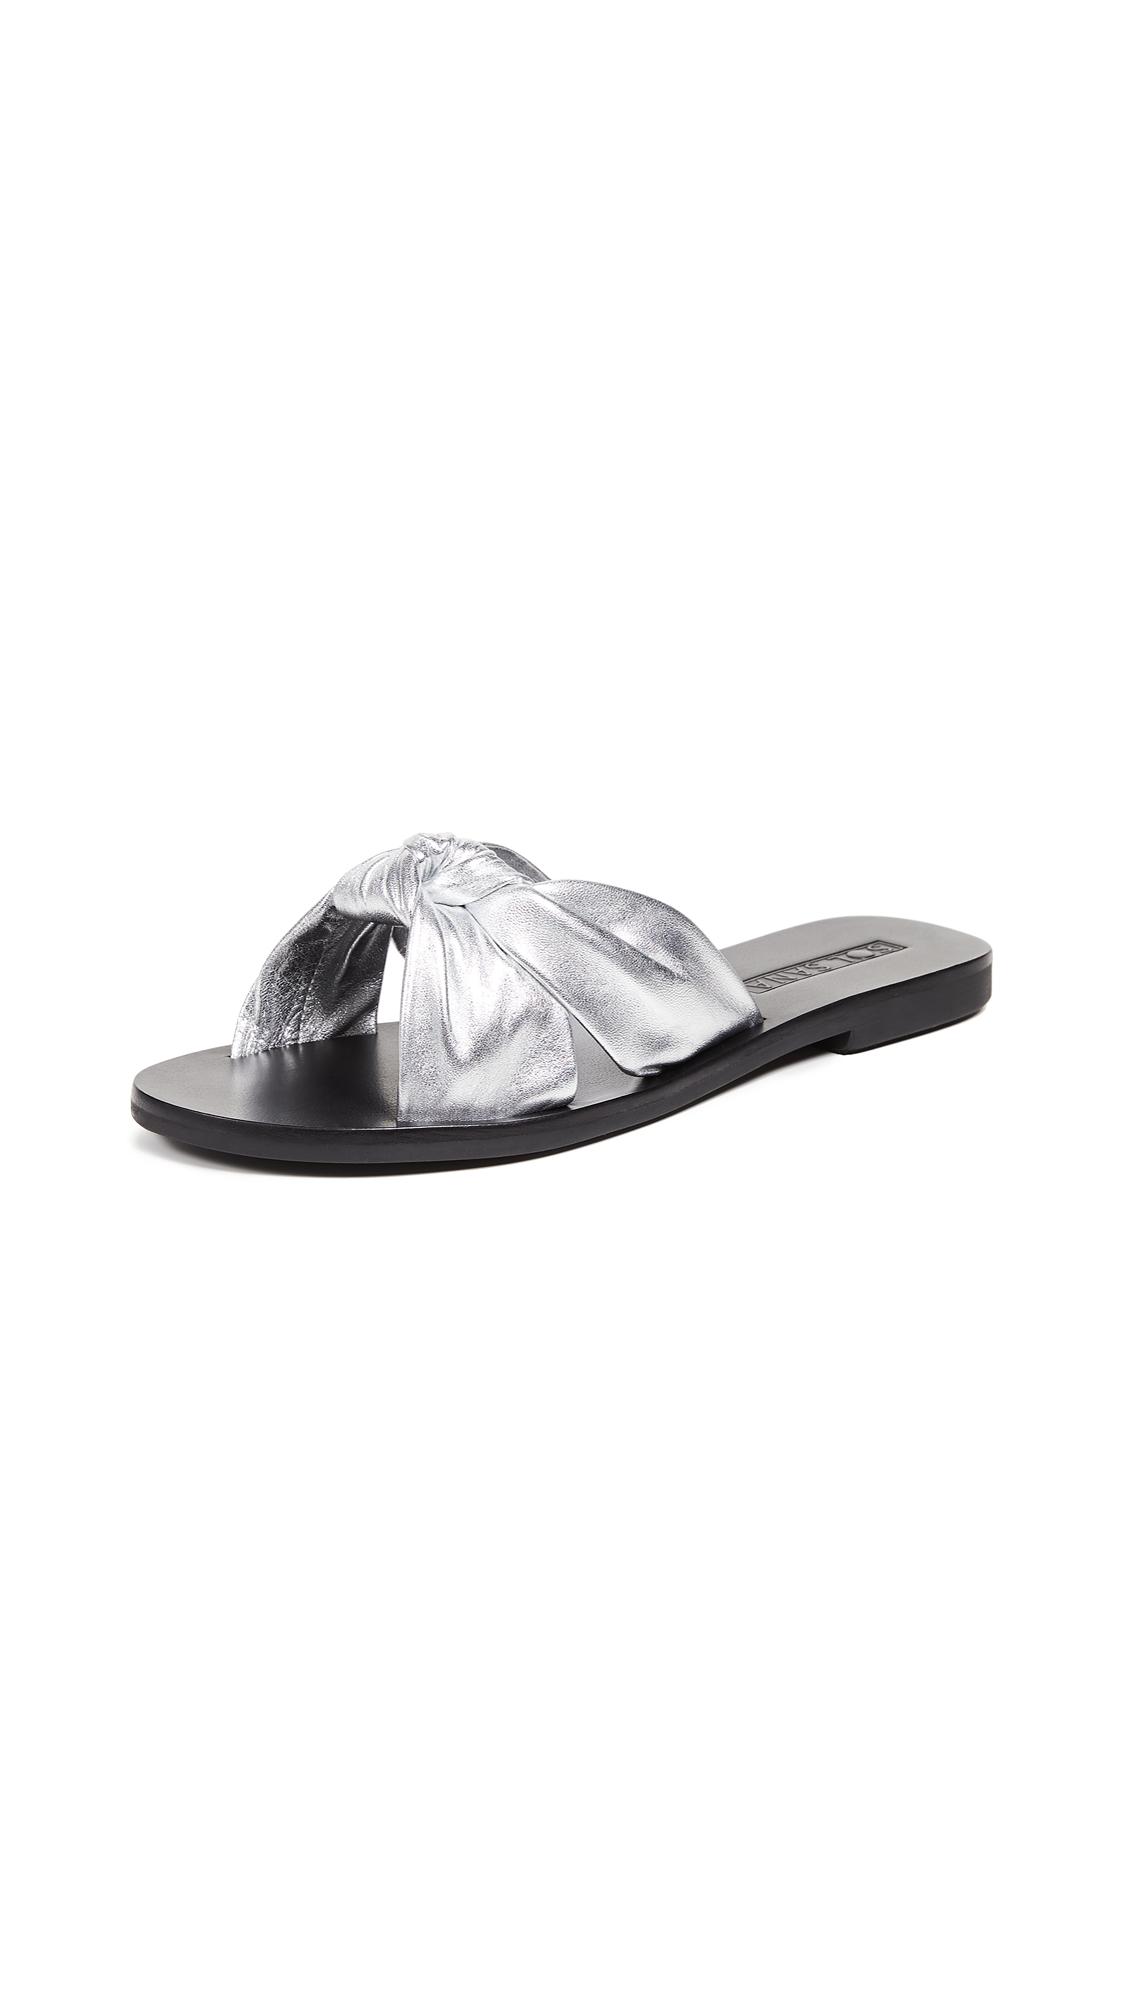 Sol Sana Paradise Slides - Silver